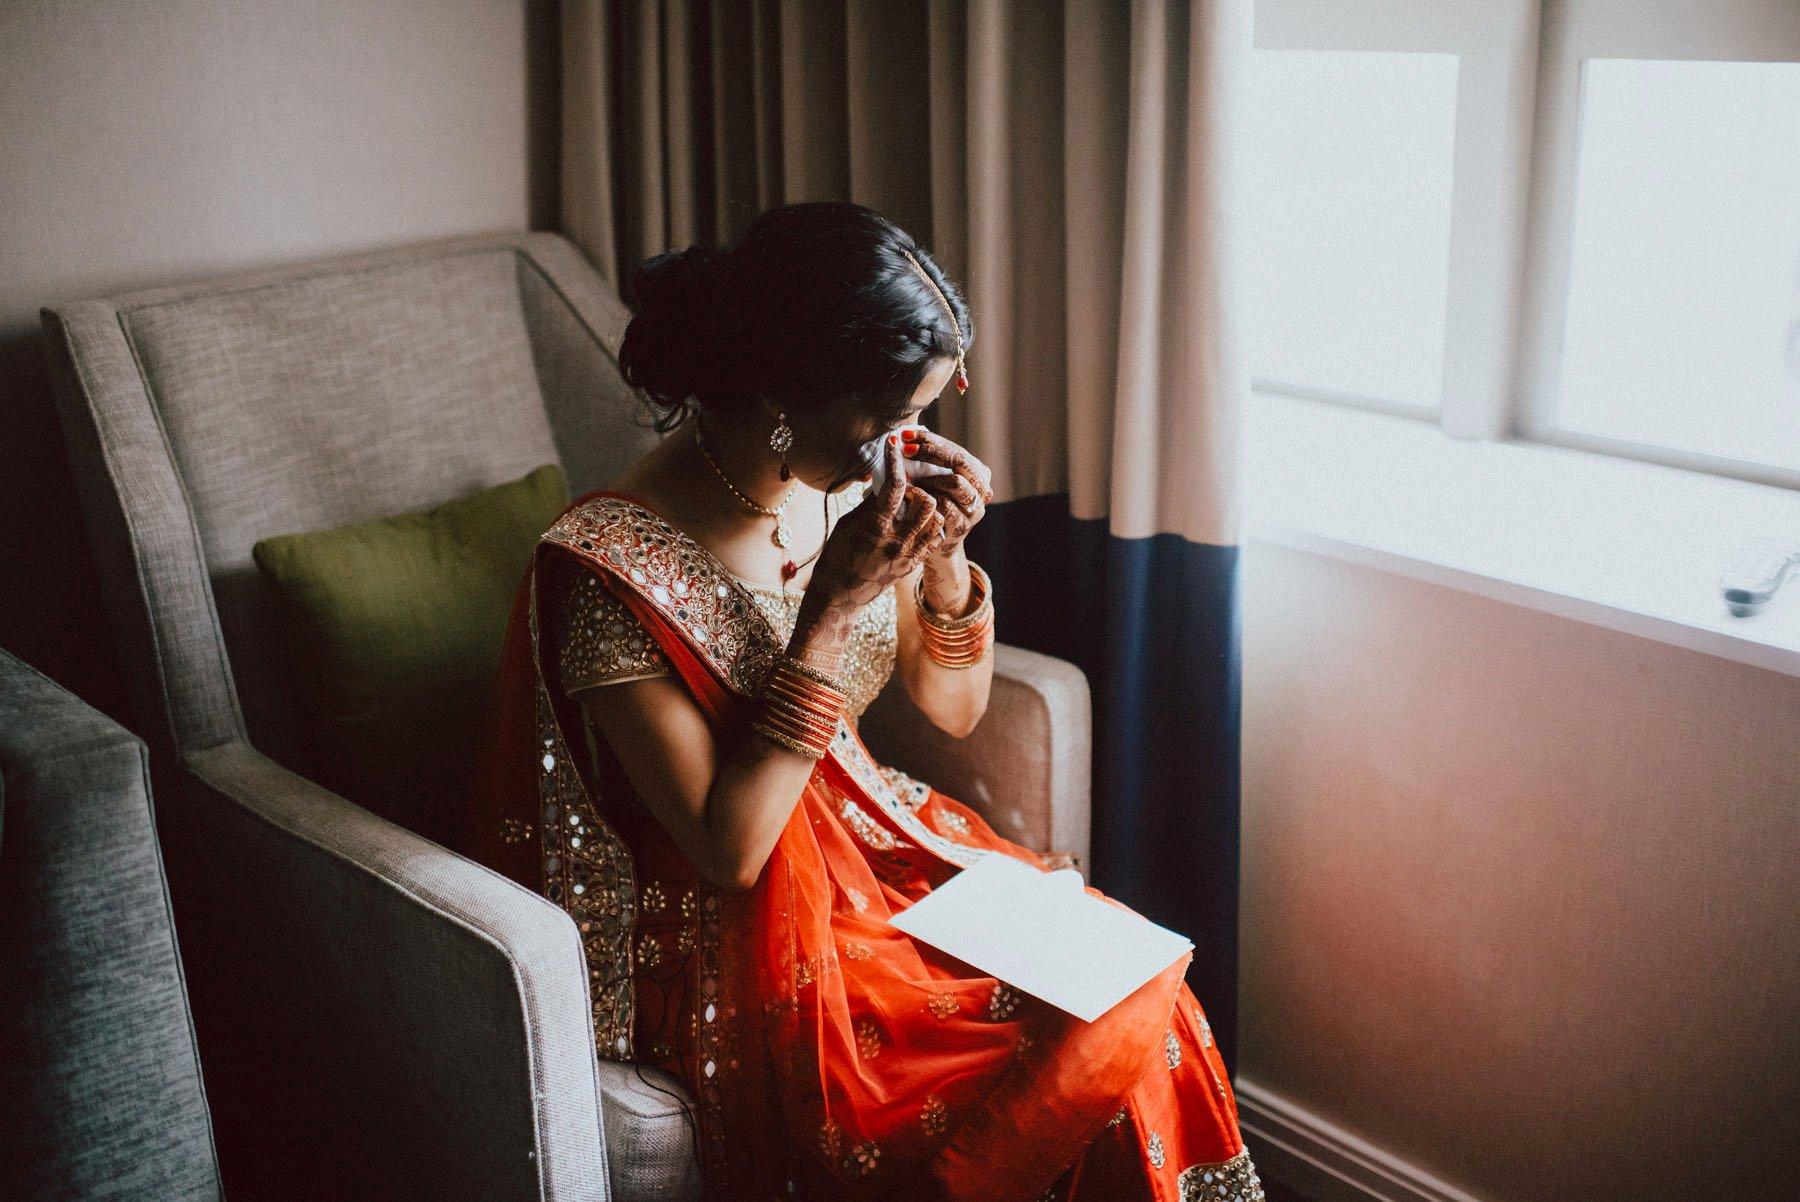 vie-philadelphia-indian-wedding-30.jpg